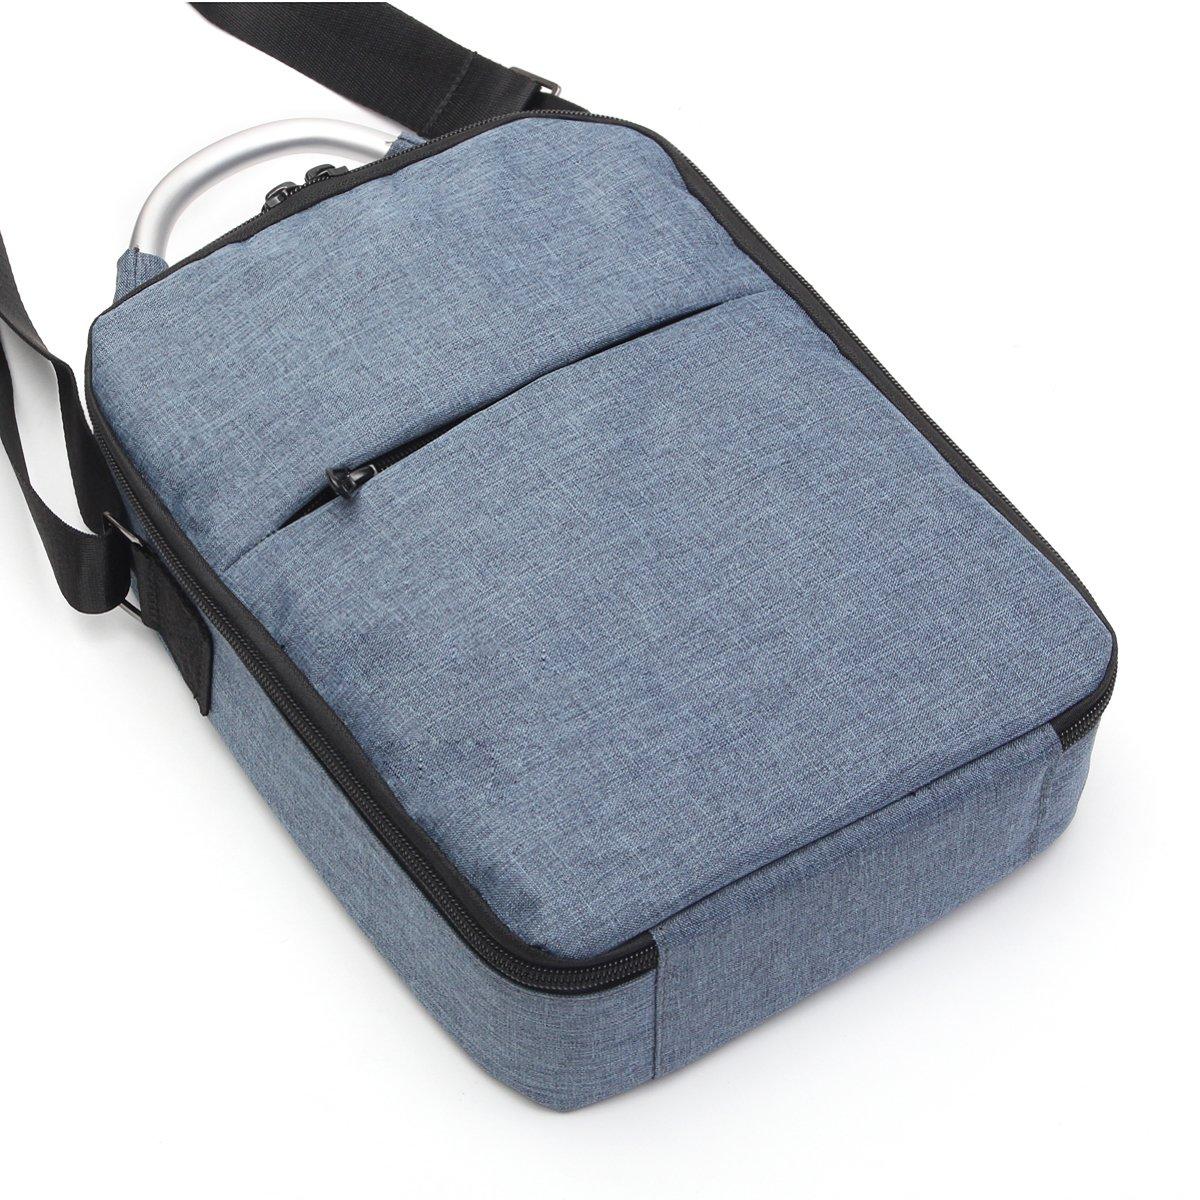 Drones Shoulder Bag for DJI Mavic